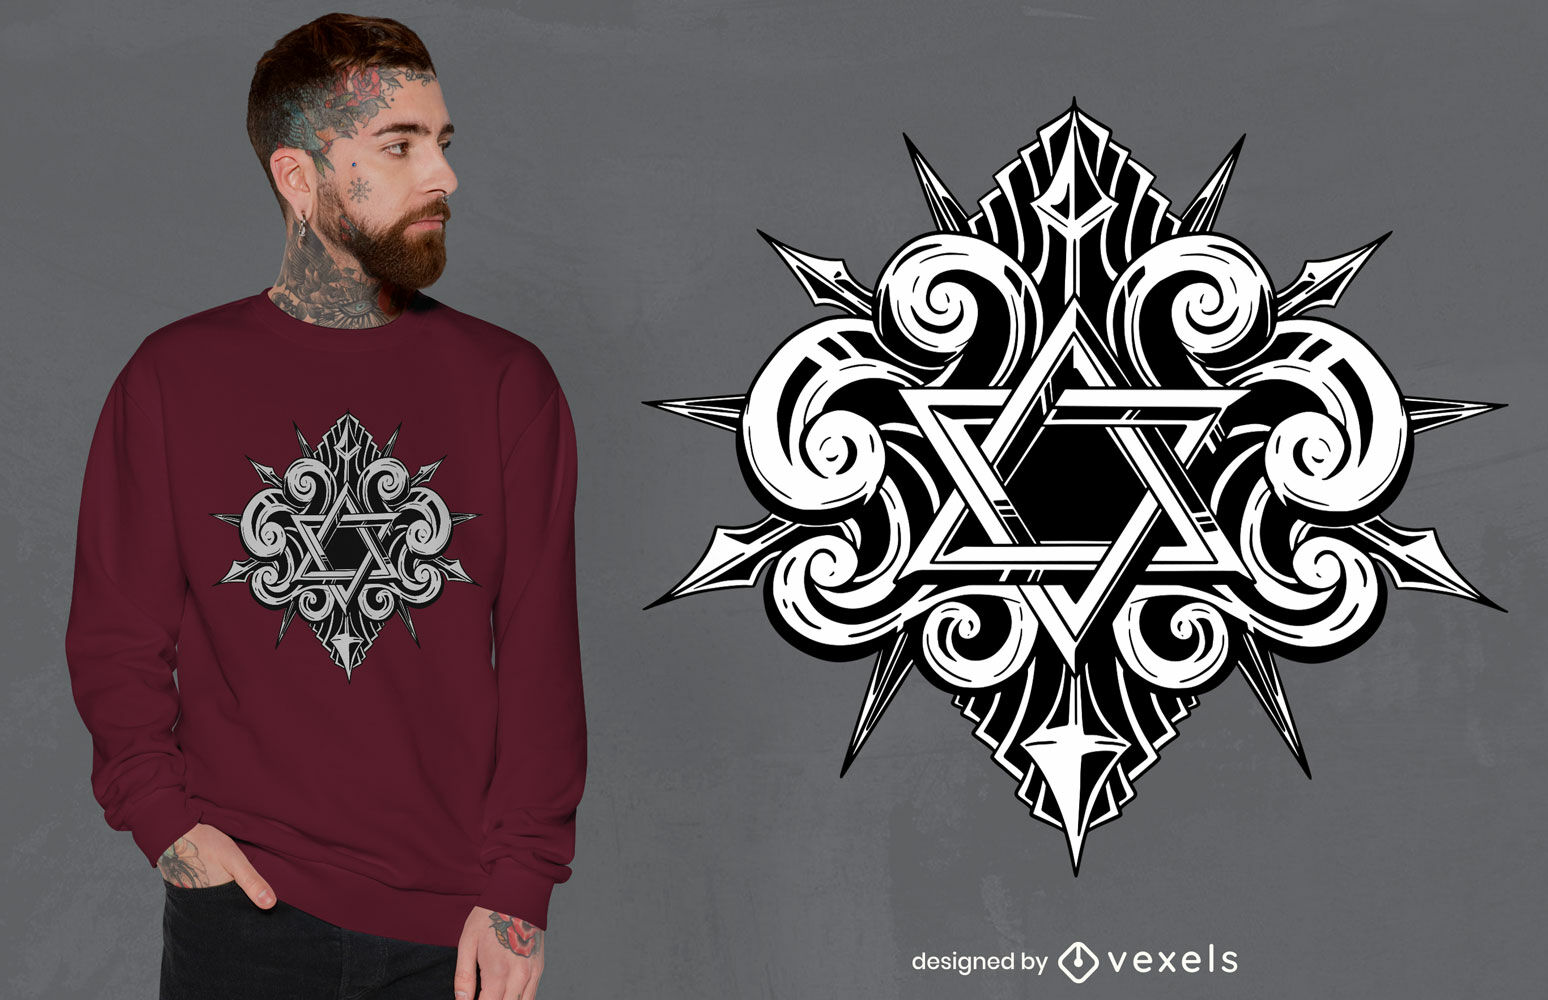 Diseño de camiseta de tatuaje de estrella de david